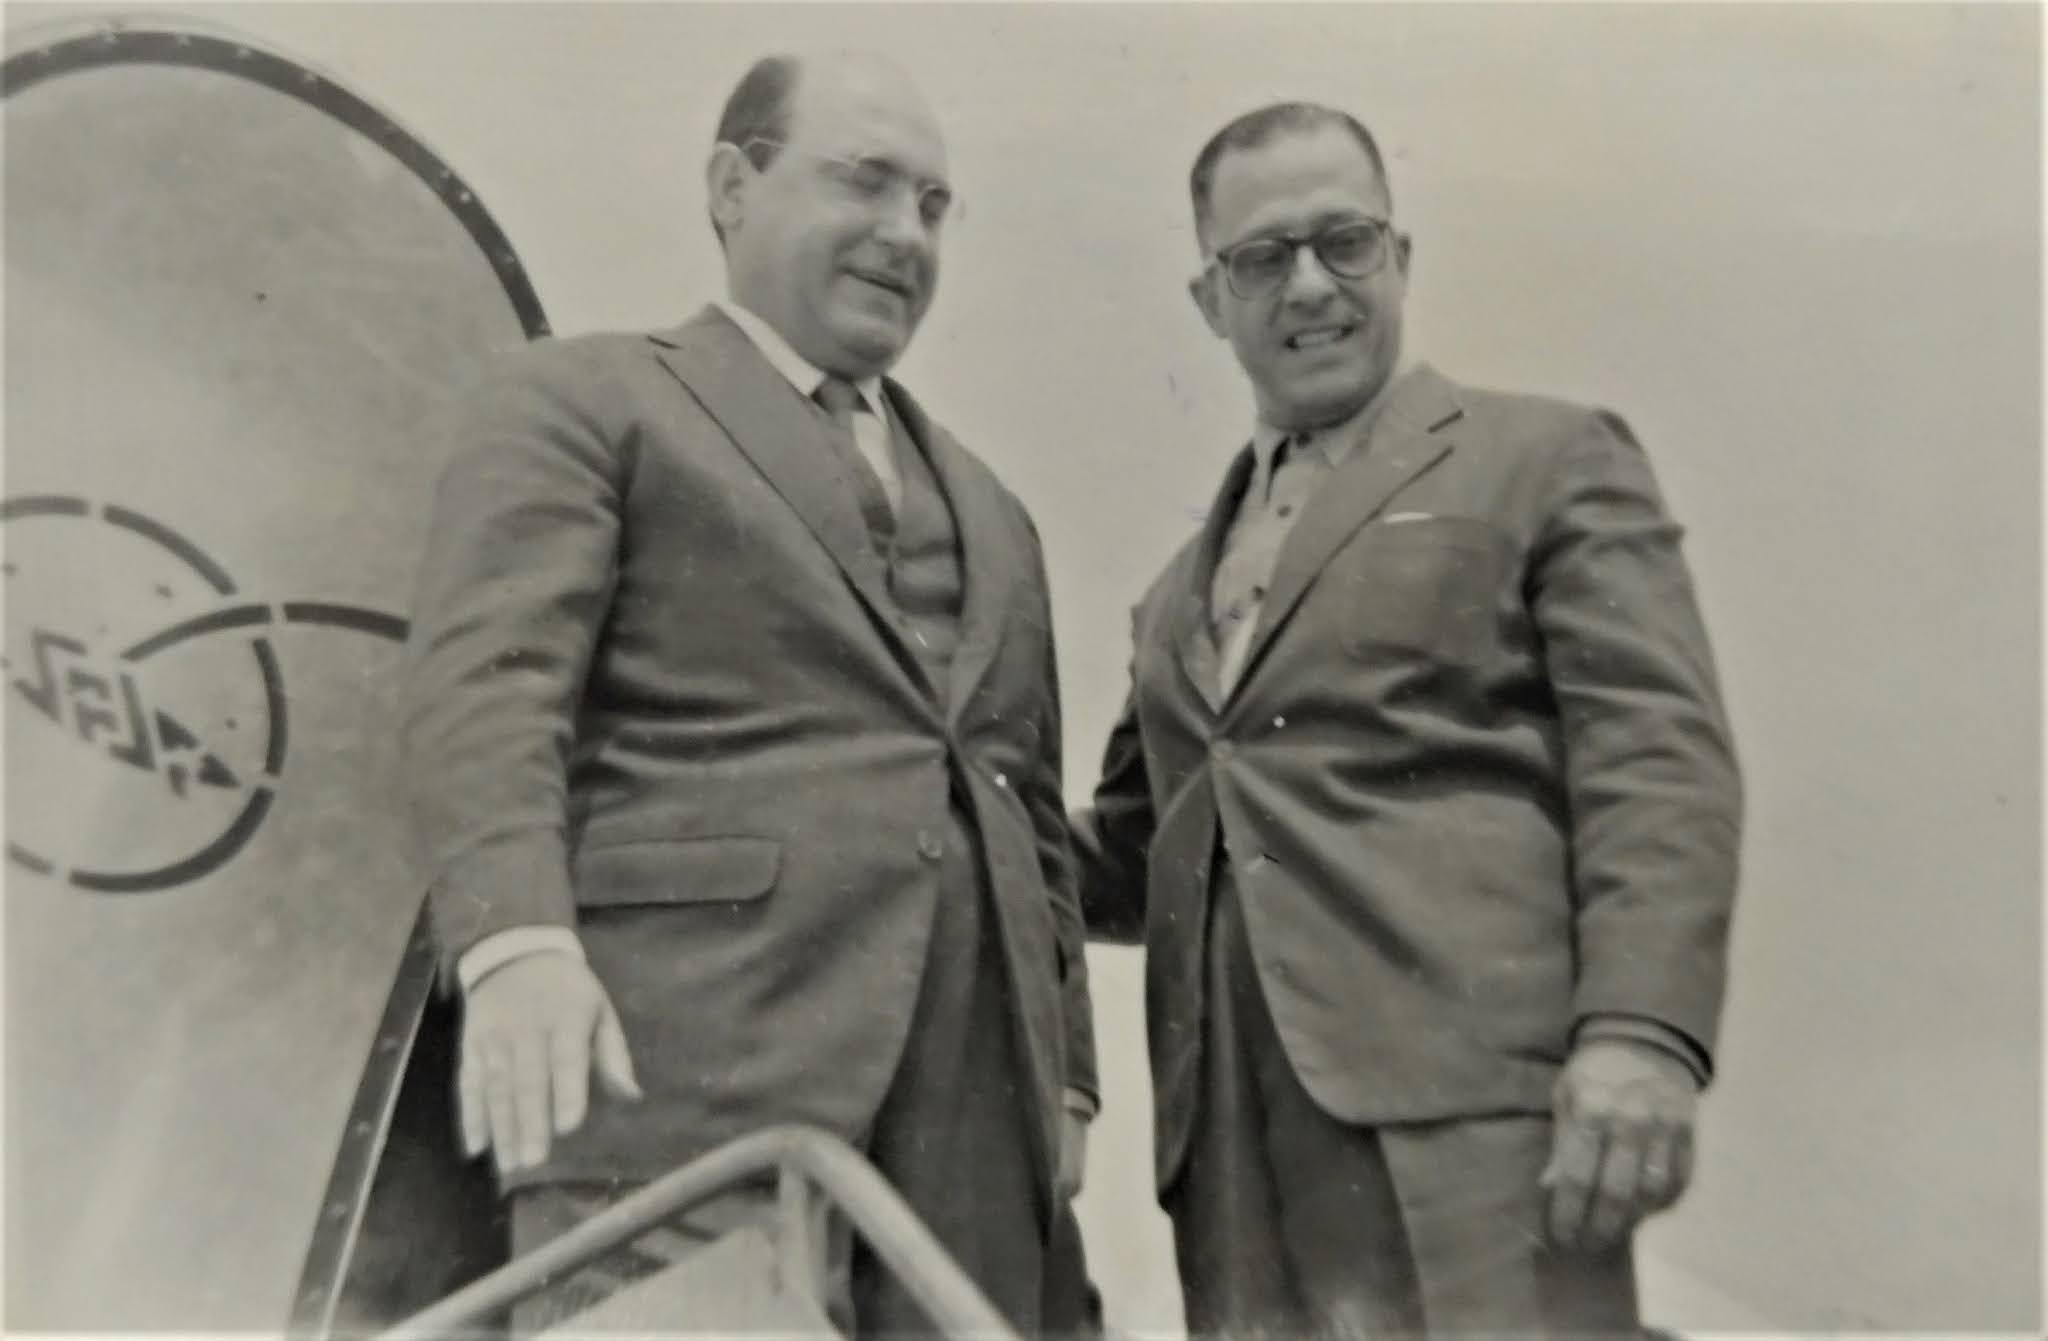 Moysés Lupion e Hermann Moraes Barros - 1956